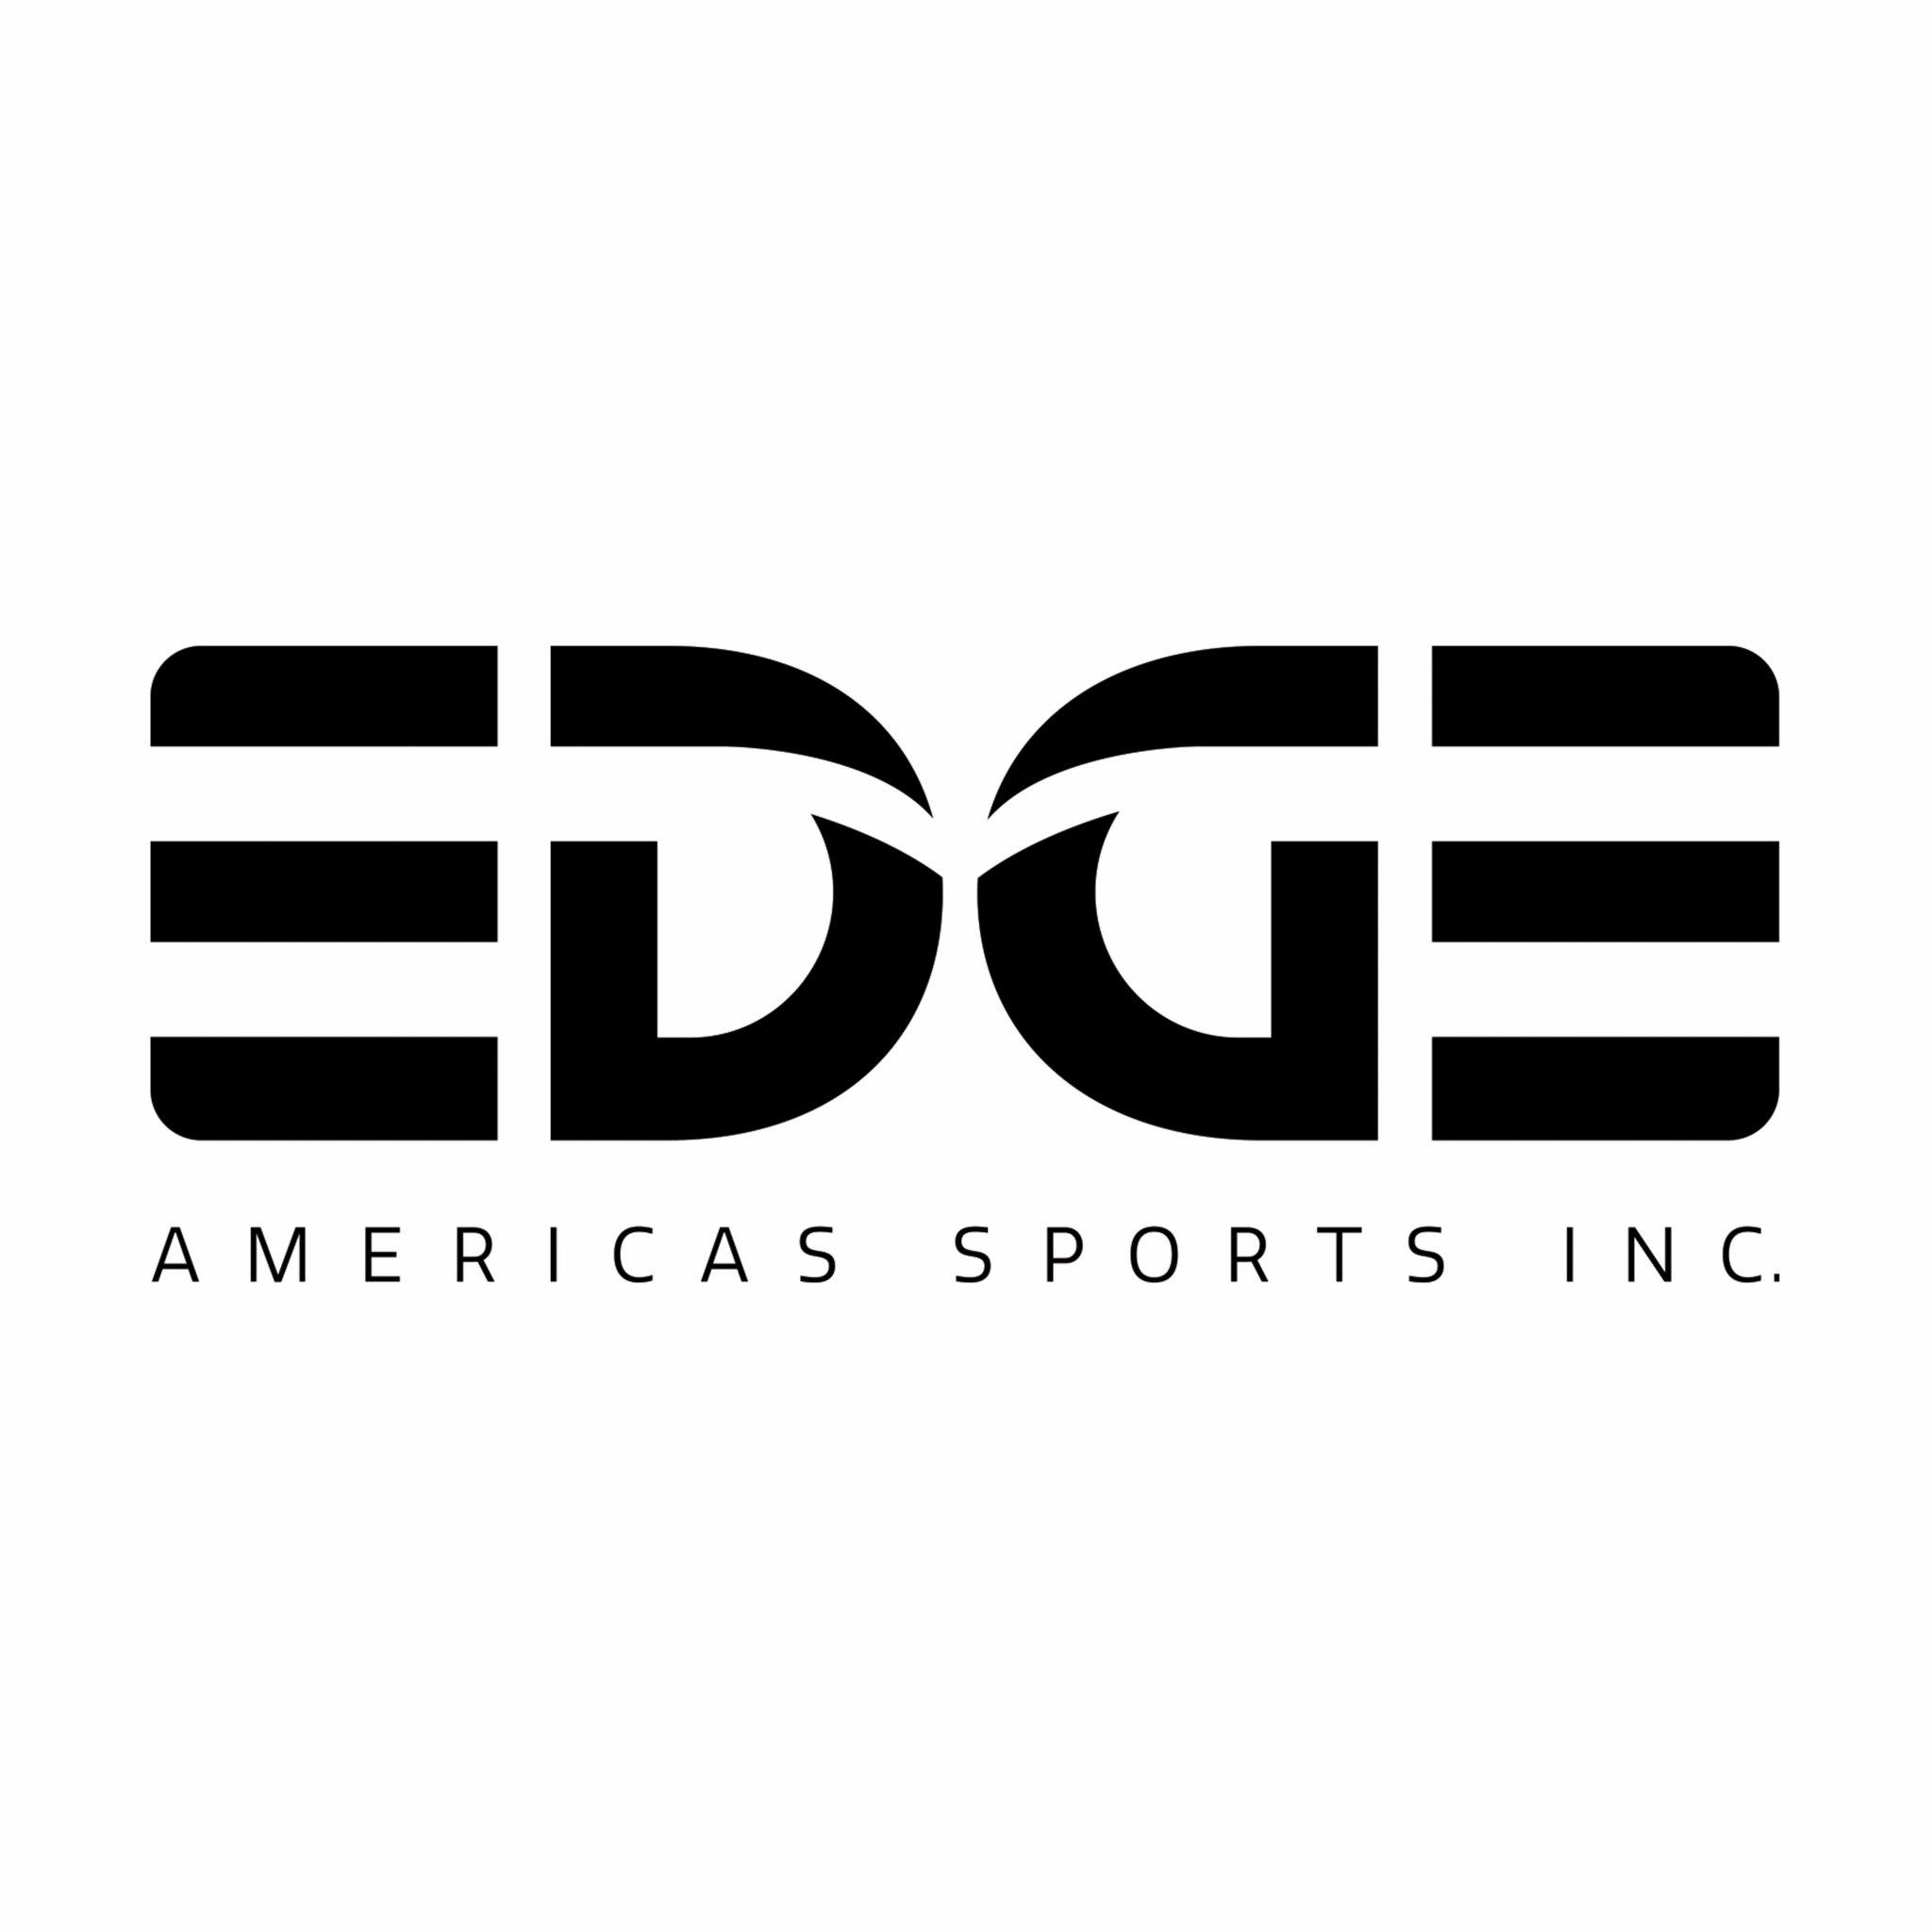 Edge Americas Sports